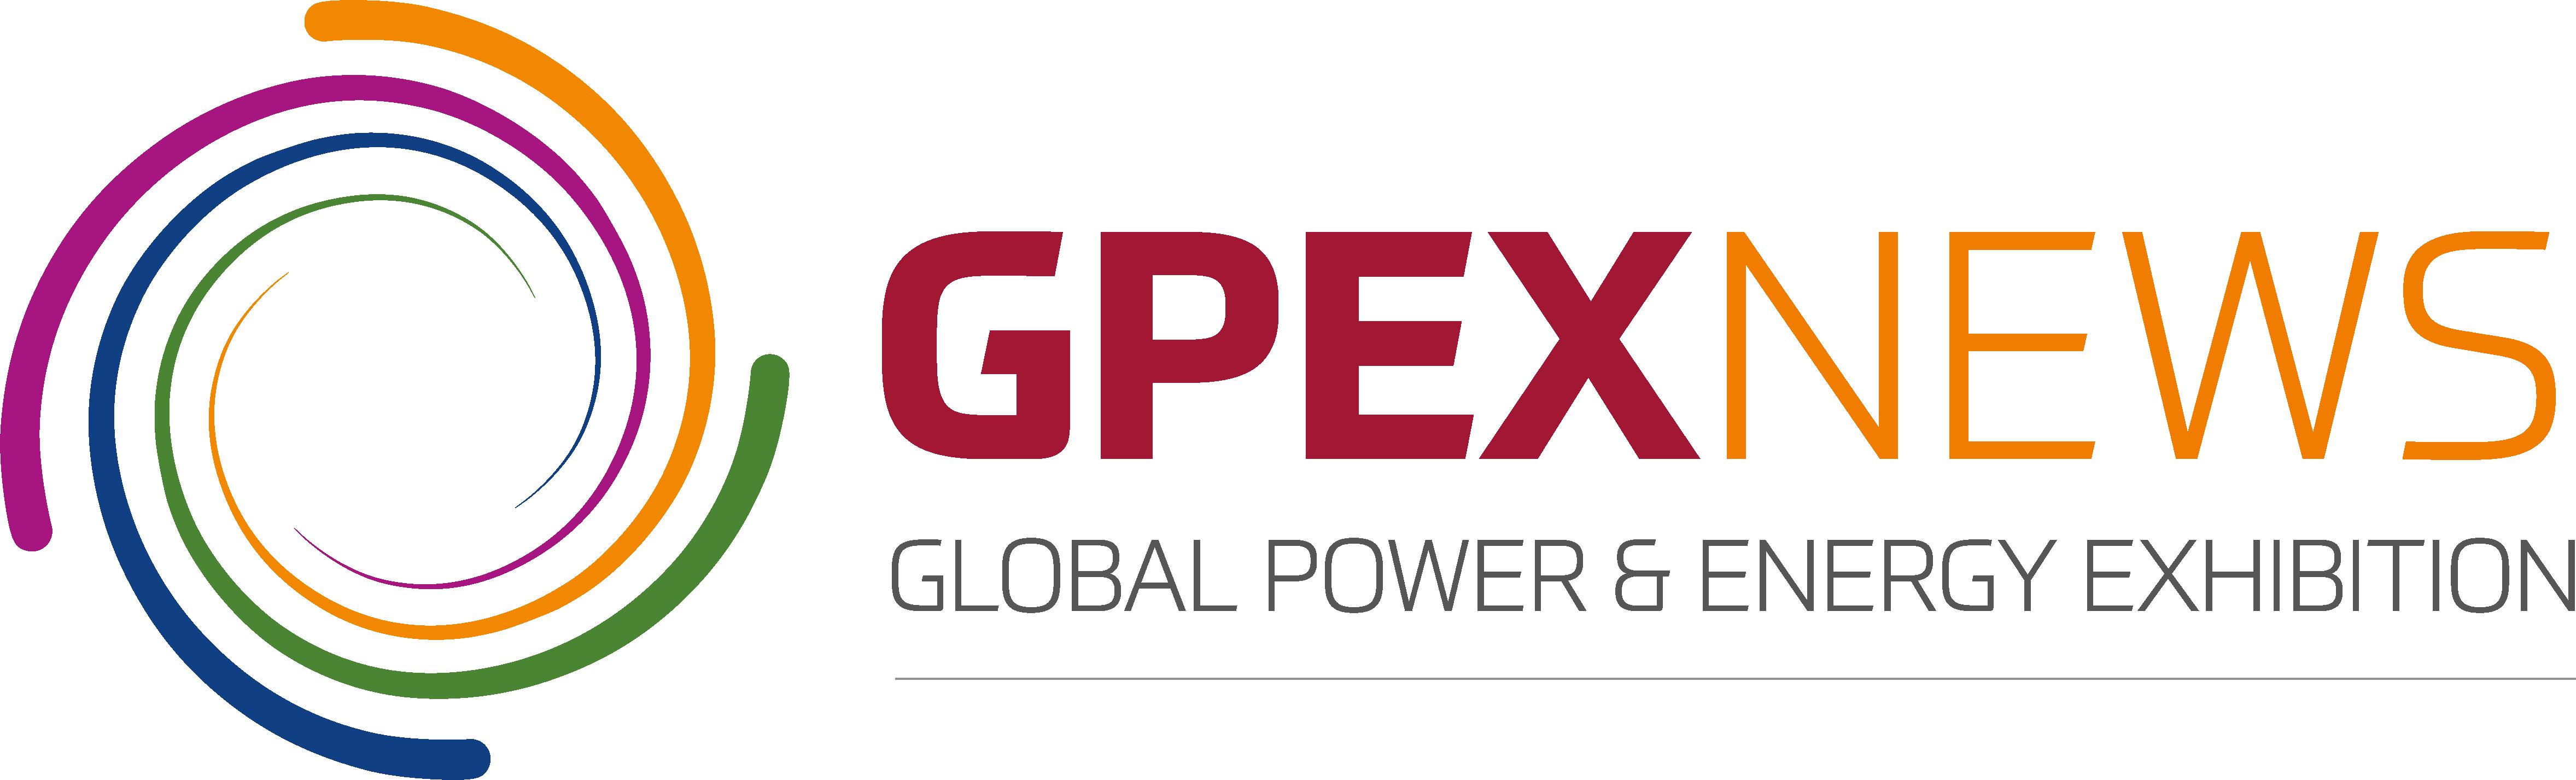 GPEXNews_logo-3